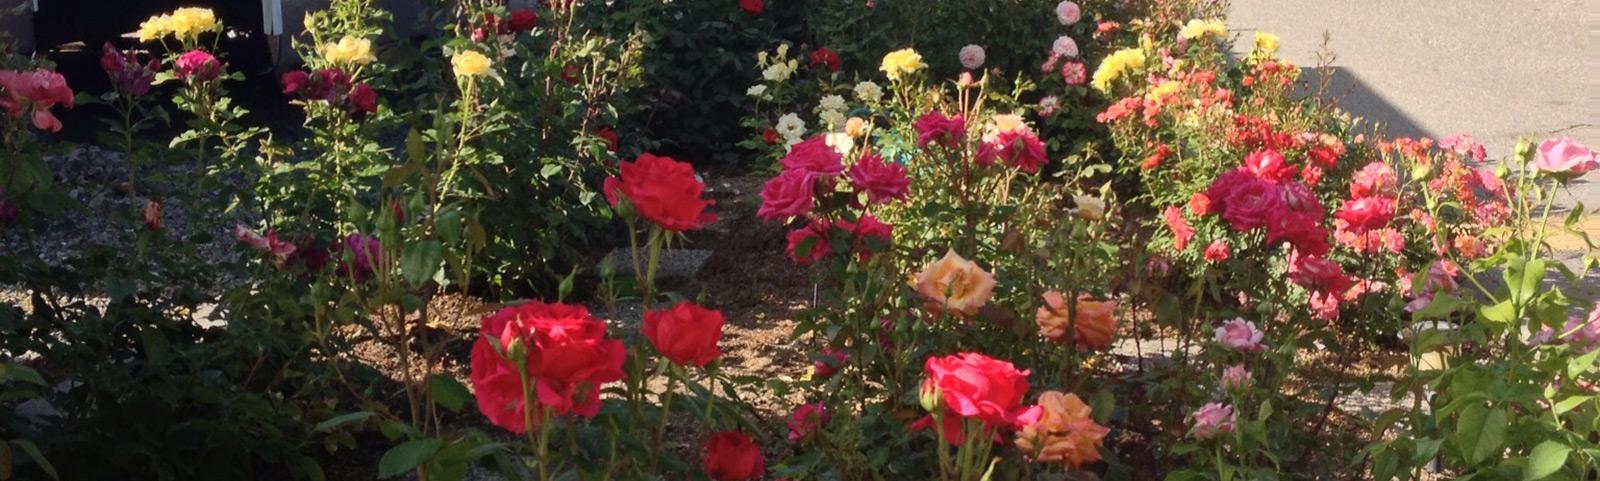 Paradise Park Rose Garden